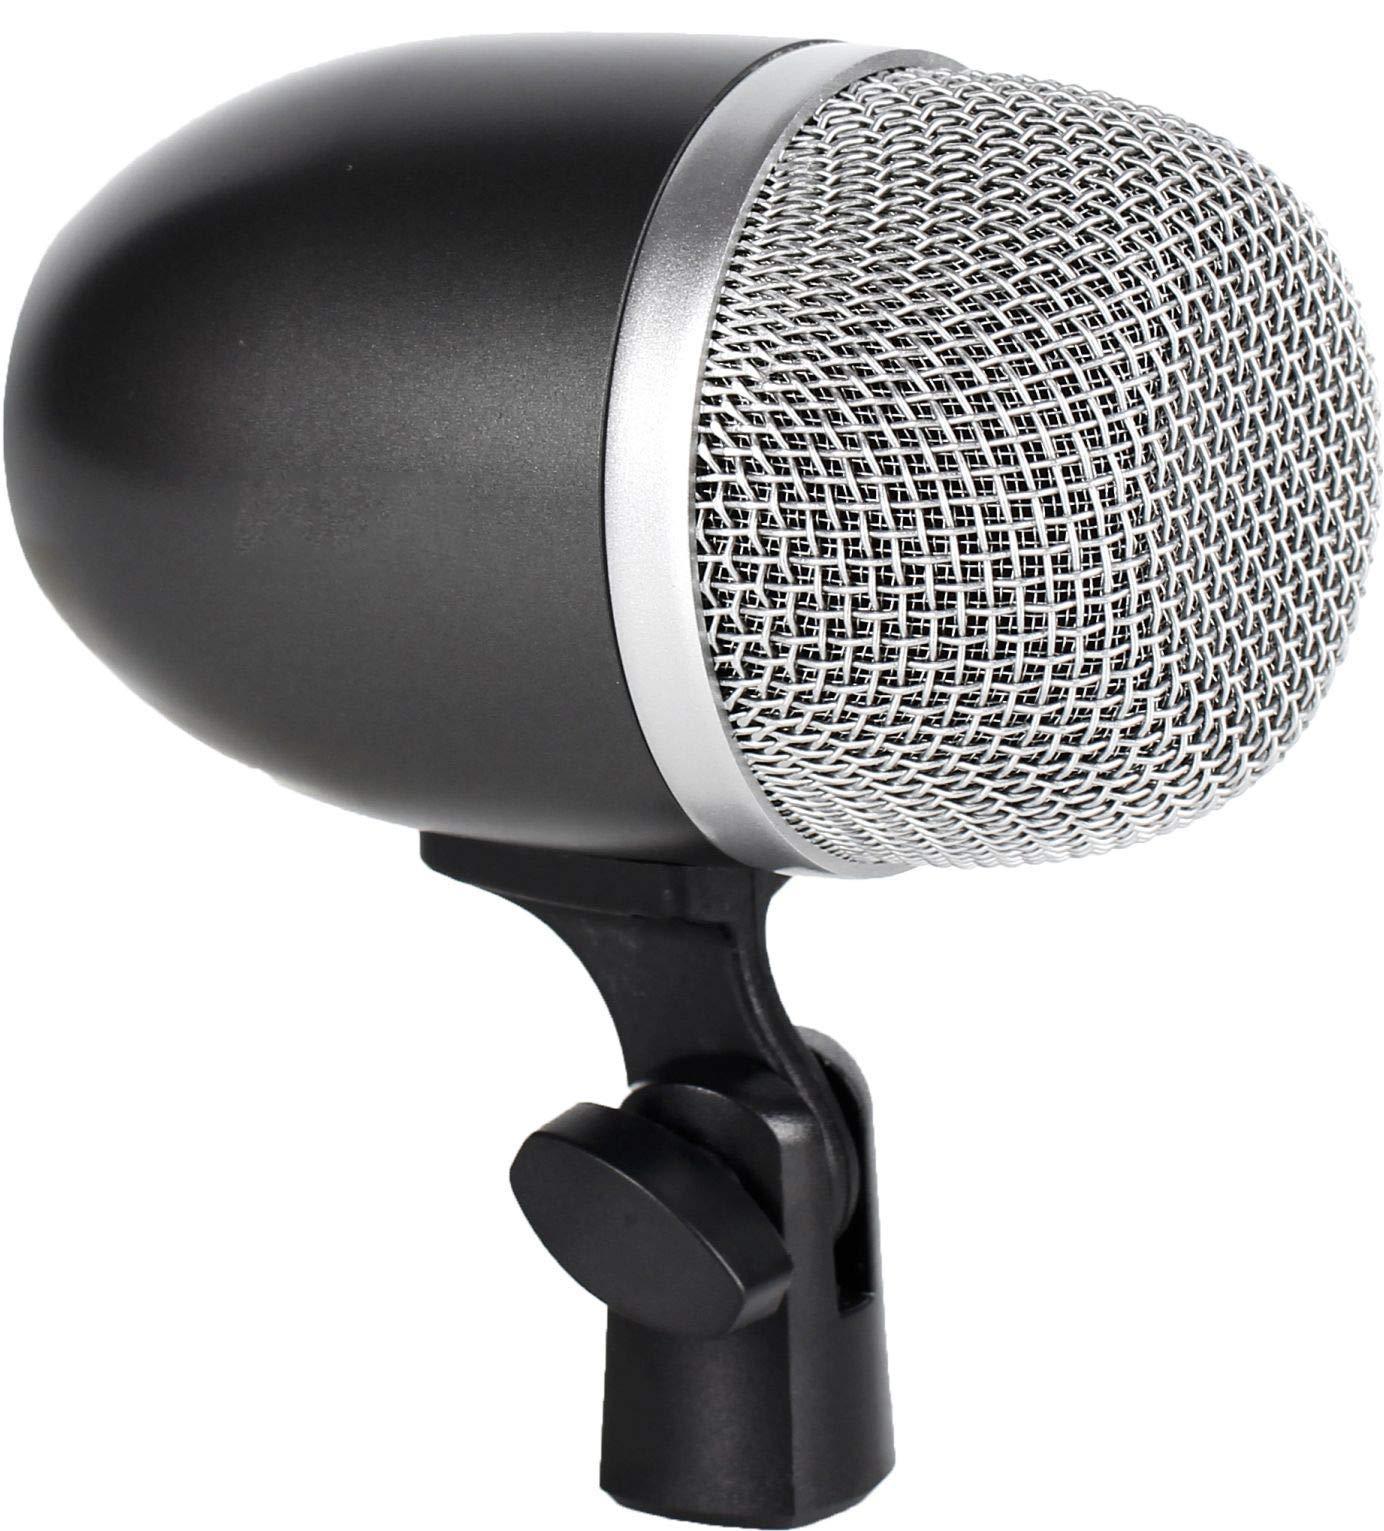 Ggf Bass Drum Microphone black